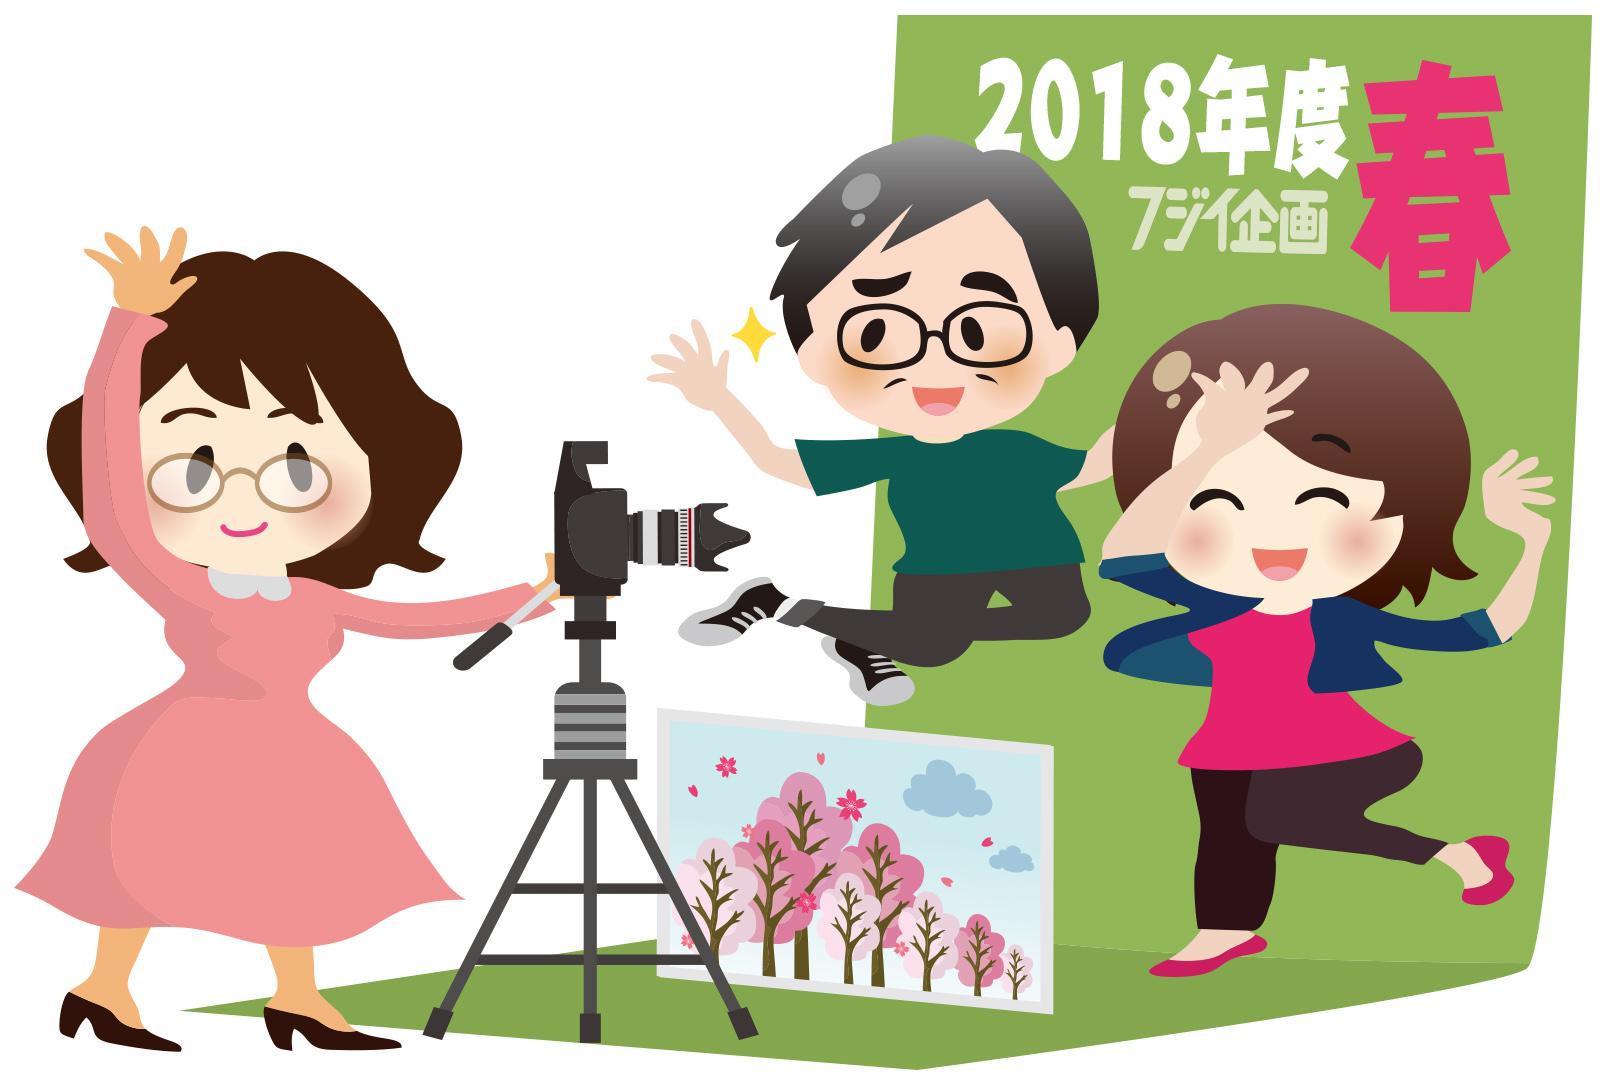 PTA新聞、会報、社報、機関紙づくり、広報紙コンクール入賞はフジイ企画(大阪)|書籍・本、冊子の企画・編集・デザイン・印刷はフジイ企画文庫へ